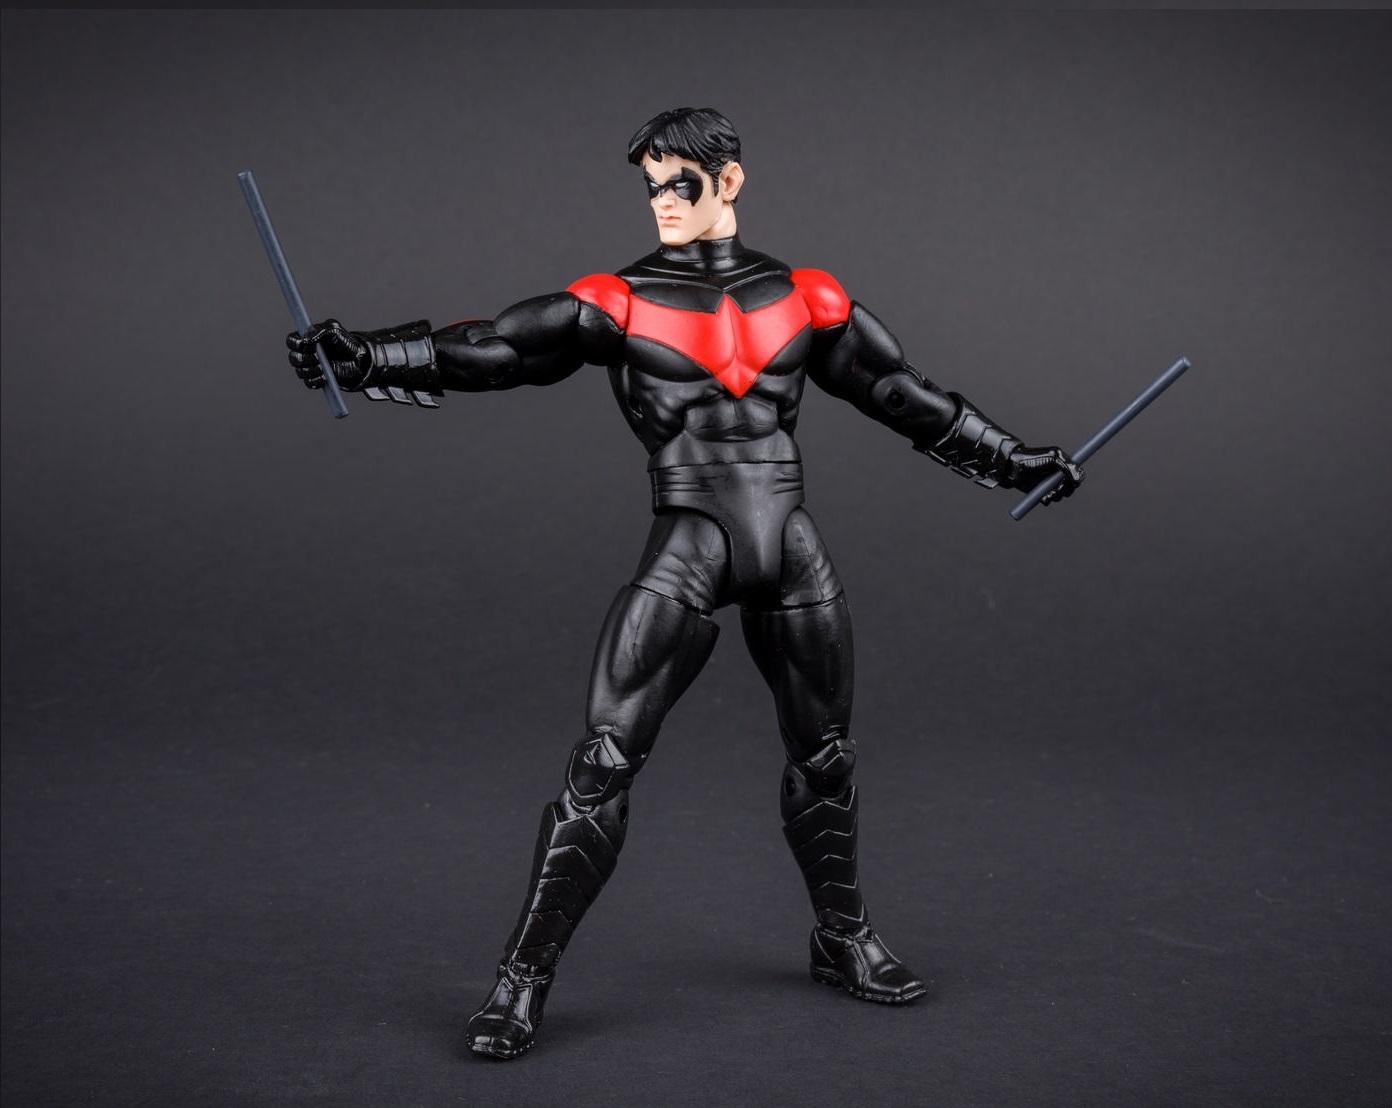 DC Comics Designer Series 01 By Greg Capullo - Nightwing